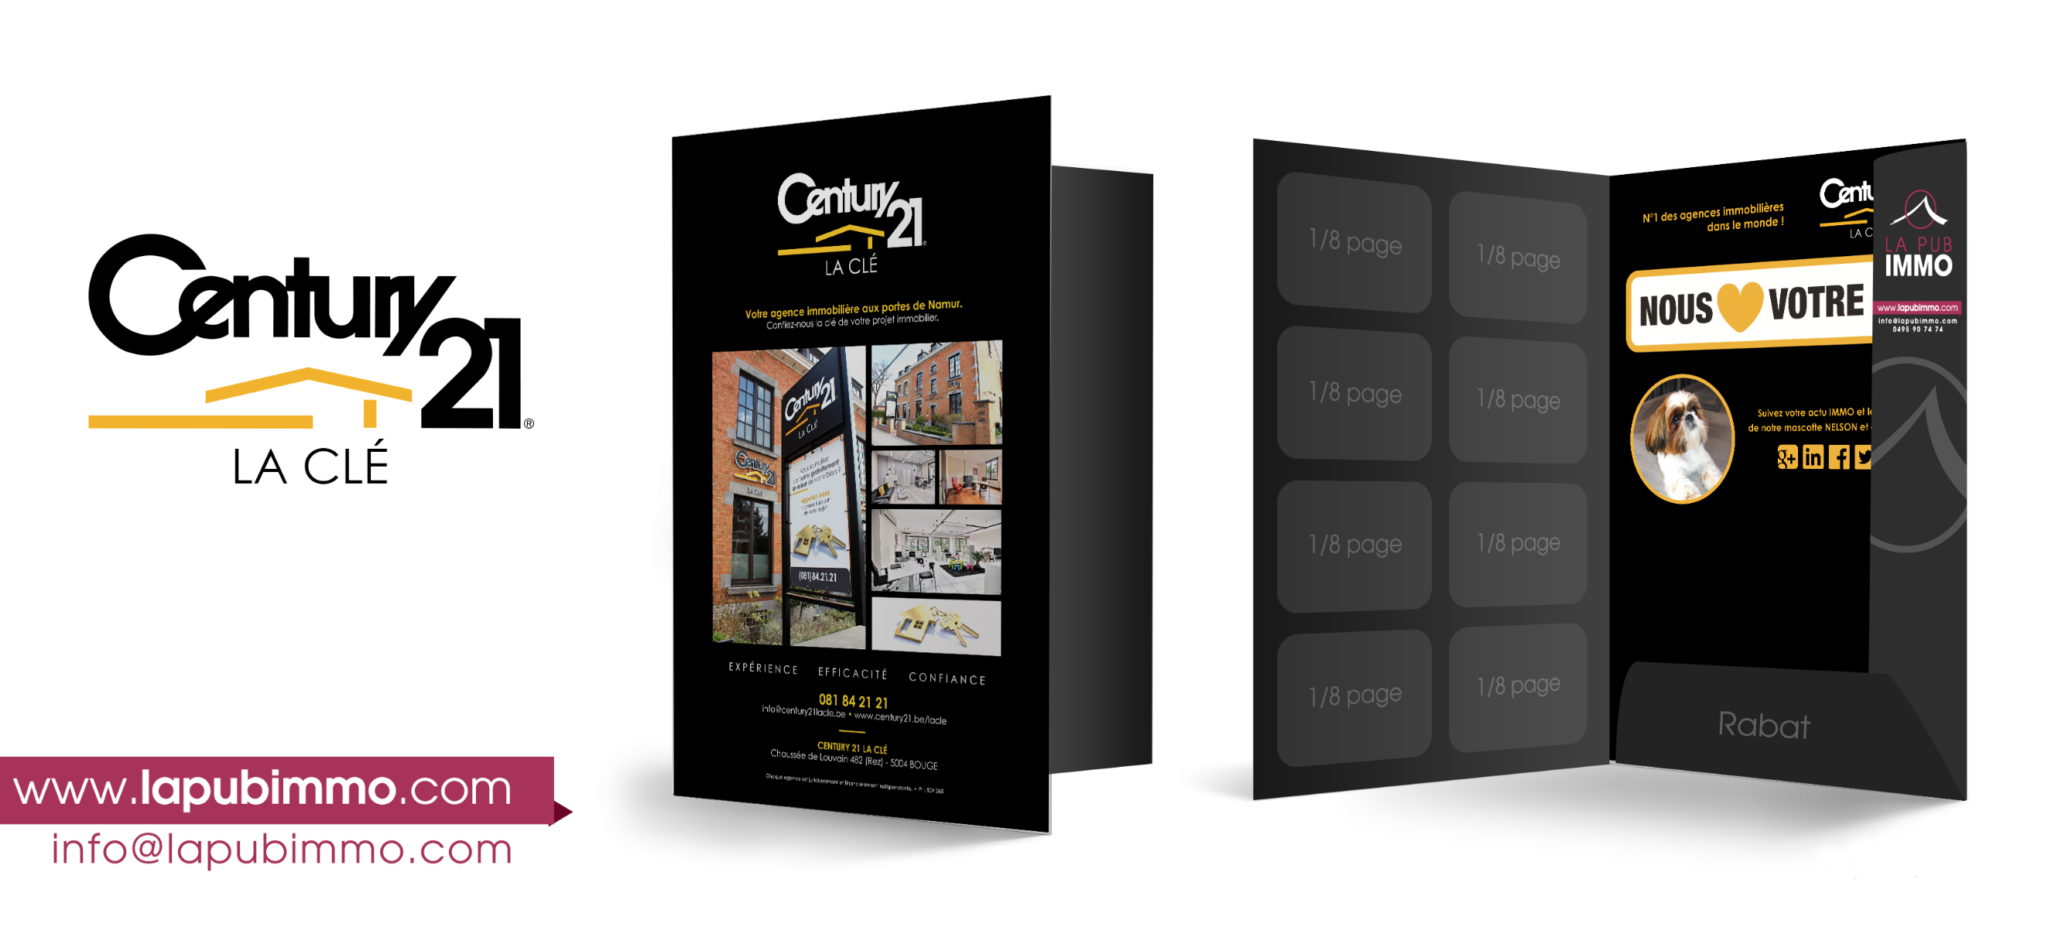 publicit immobili re la pub immo pub immo la pub immo. Black Bedroom Furniture Sets. Home Design Ideas